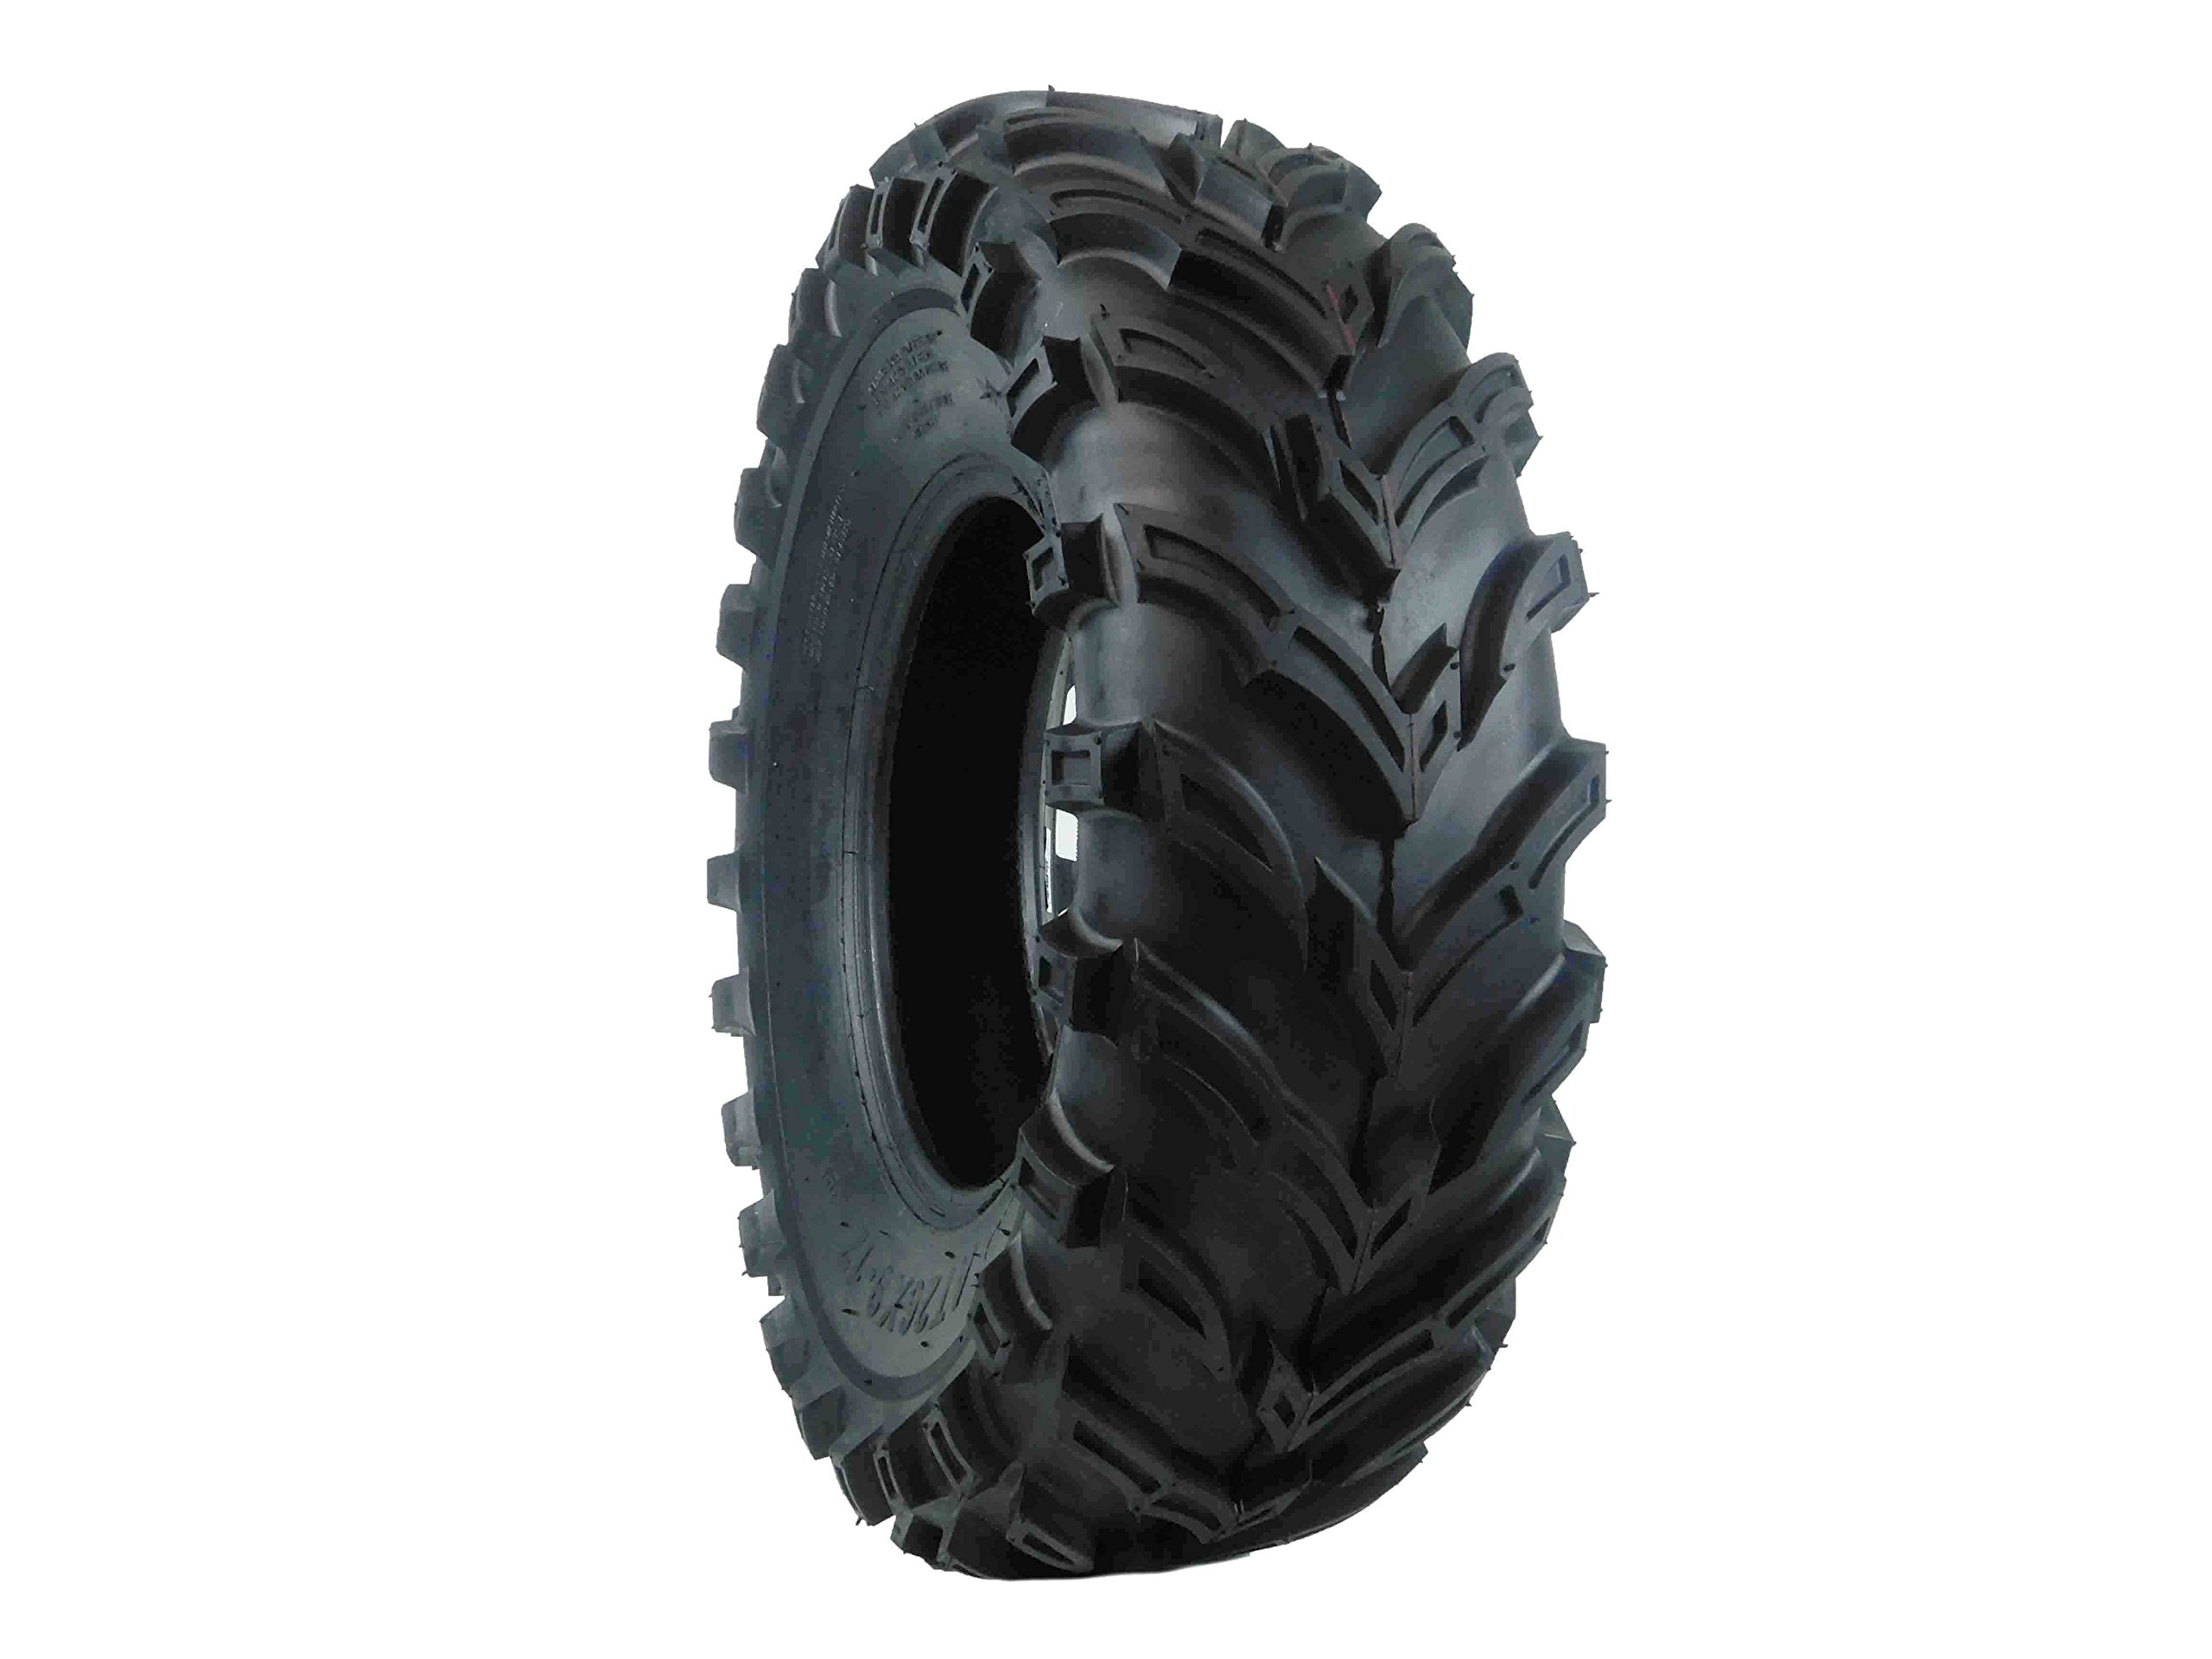 New Single MASSFX MS ATV/UTV Tire 26 x9-12 Front, 26x9x12 26x9/12